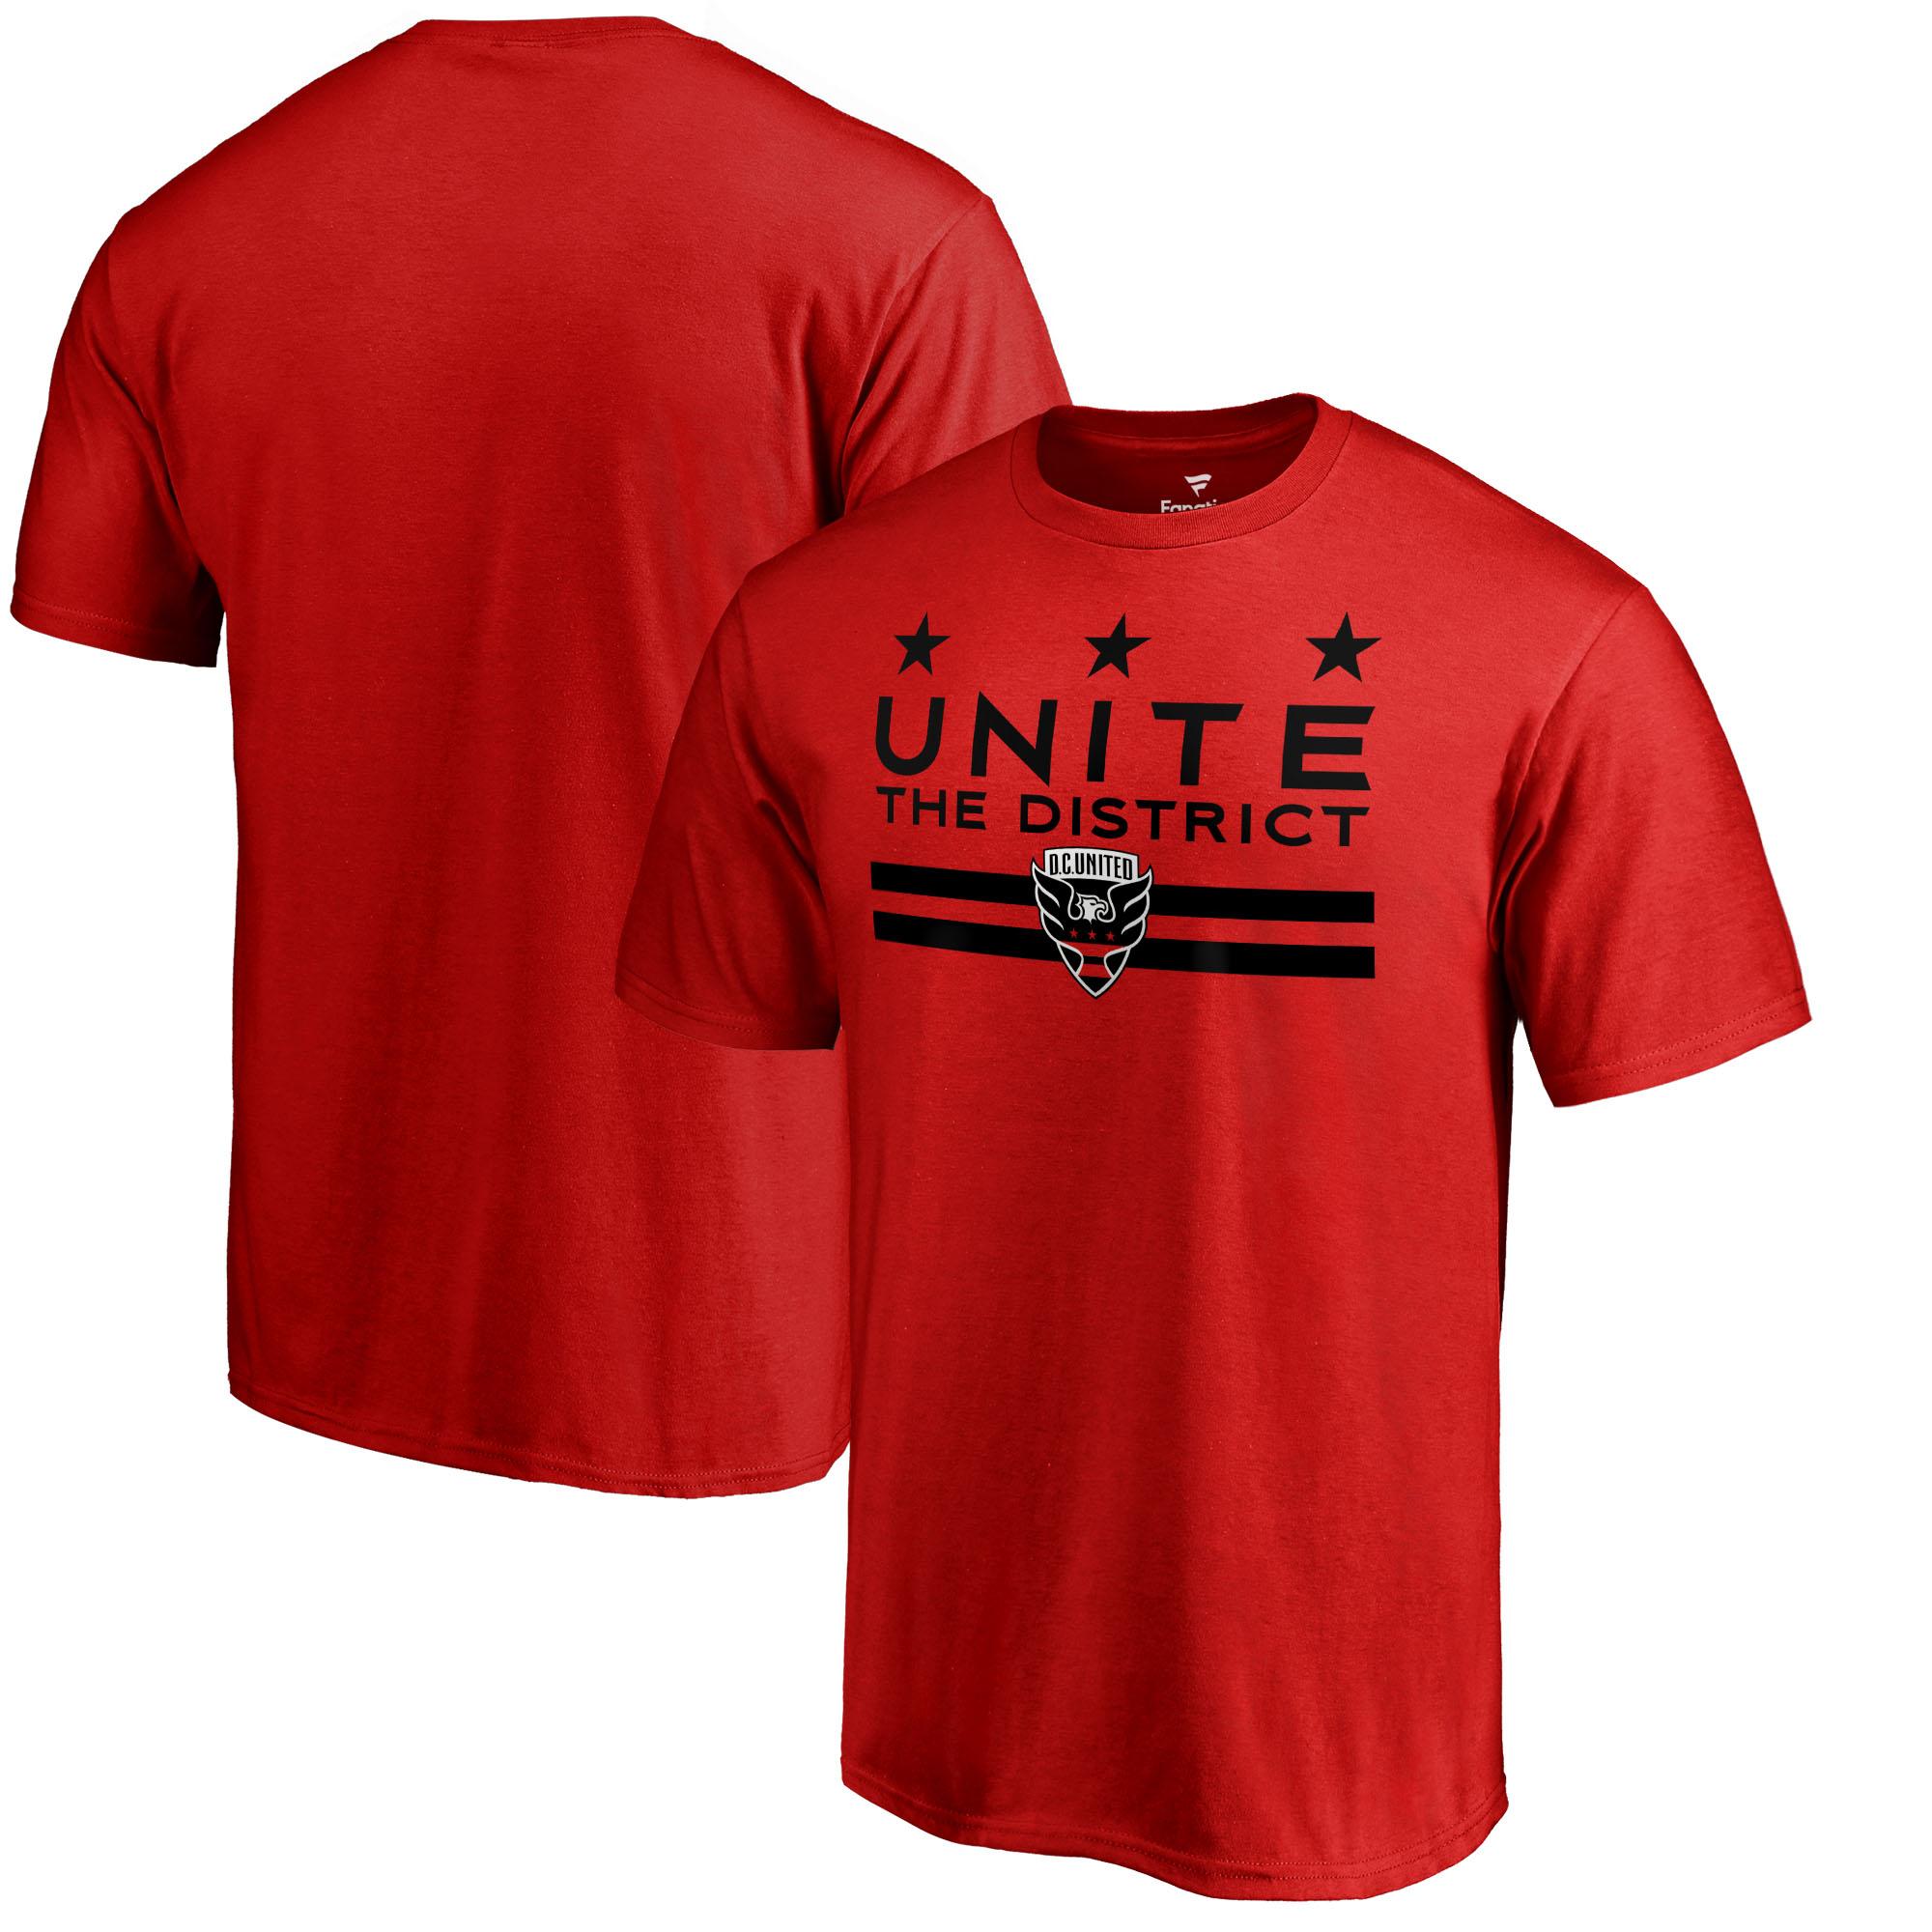 D.C. United Fanatics Branded 2018 Inaugural Season Audi Field Unite the District T-Shirt - Red